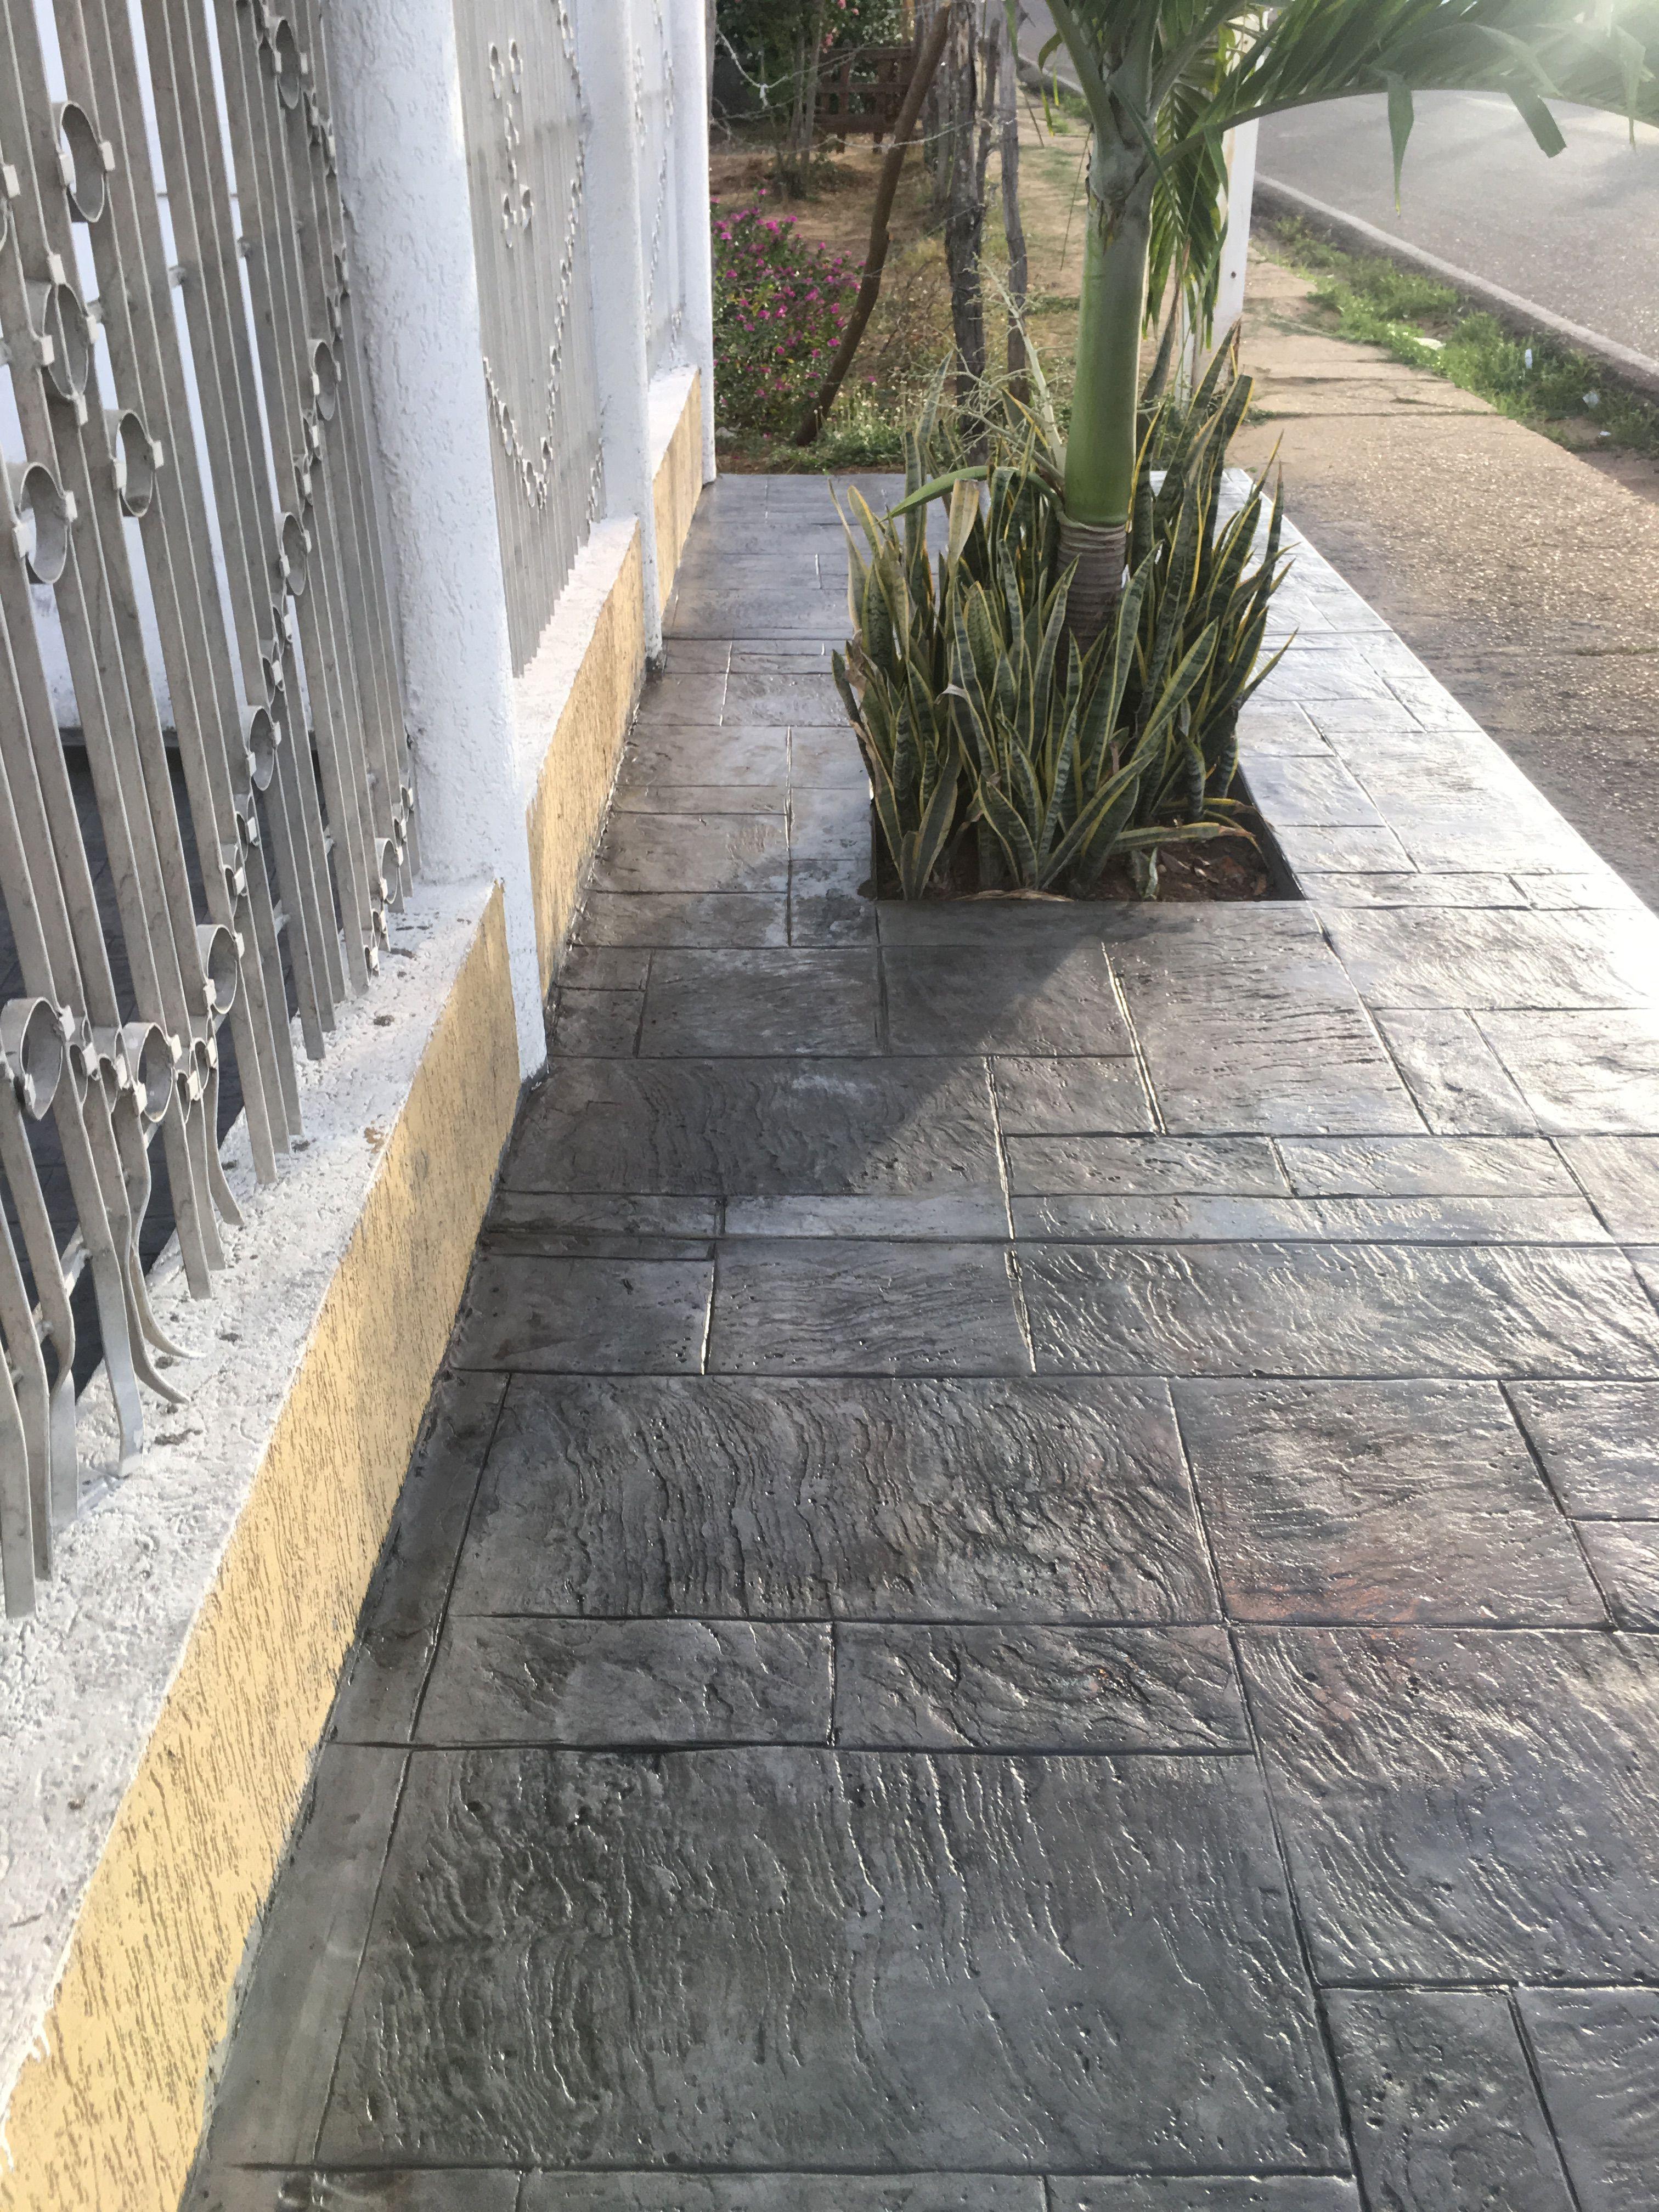 Pisos estampados de concreto home en 2018 pinterest for Cemento estampado fotos